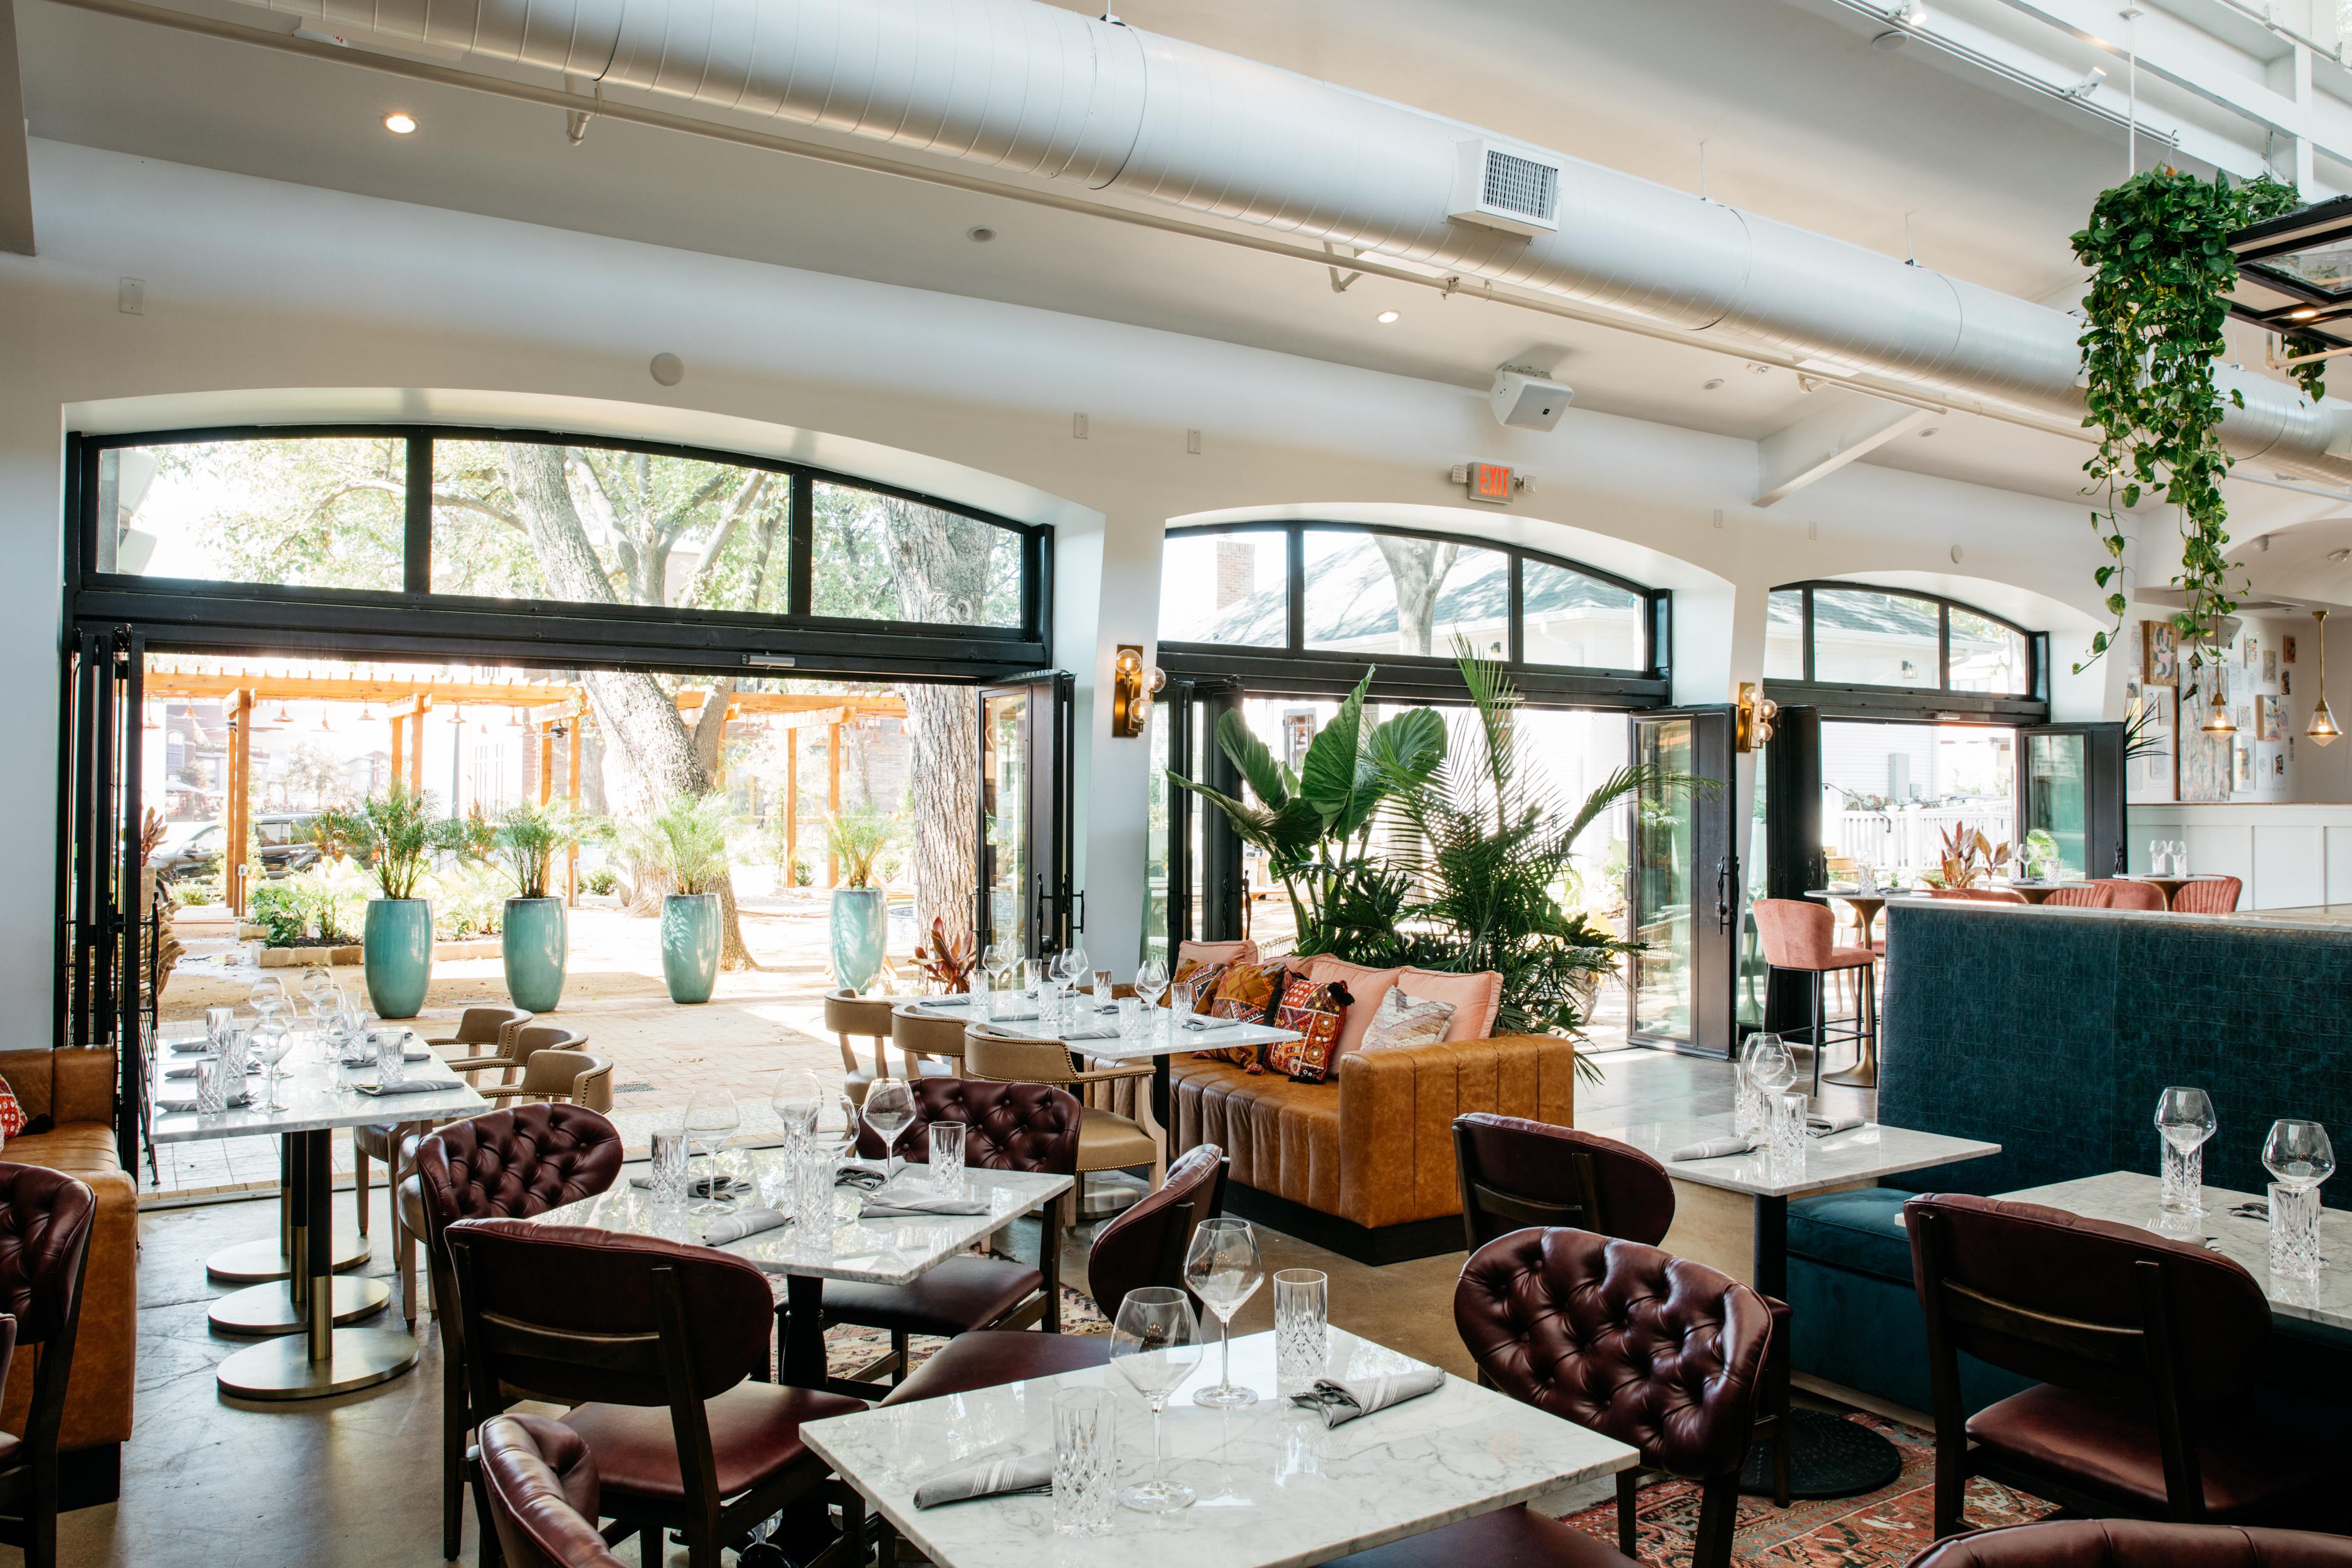 Bishop Arts's Newest Restaurant Will Serve Chic European Eats on Roving Bar Carts